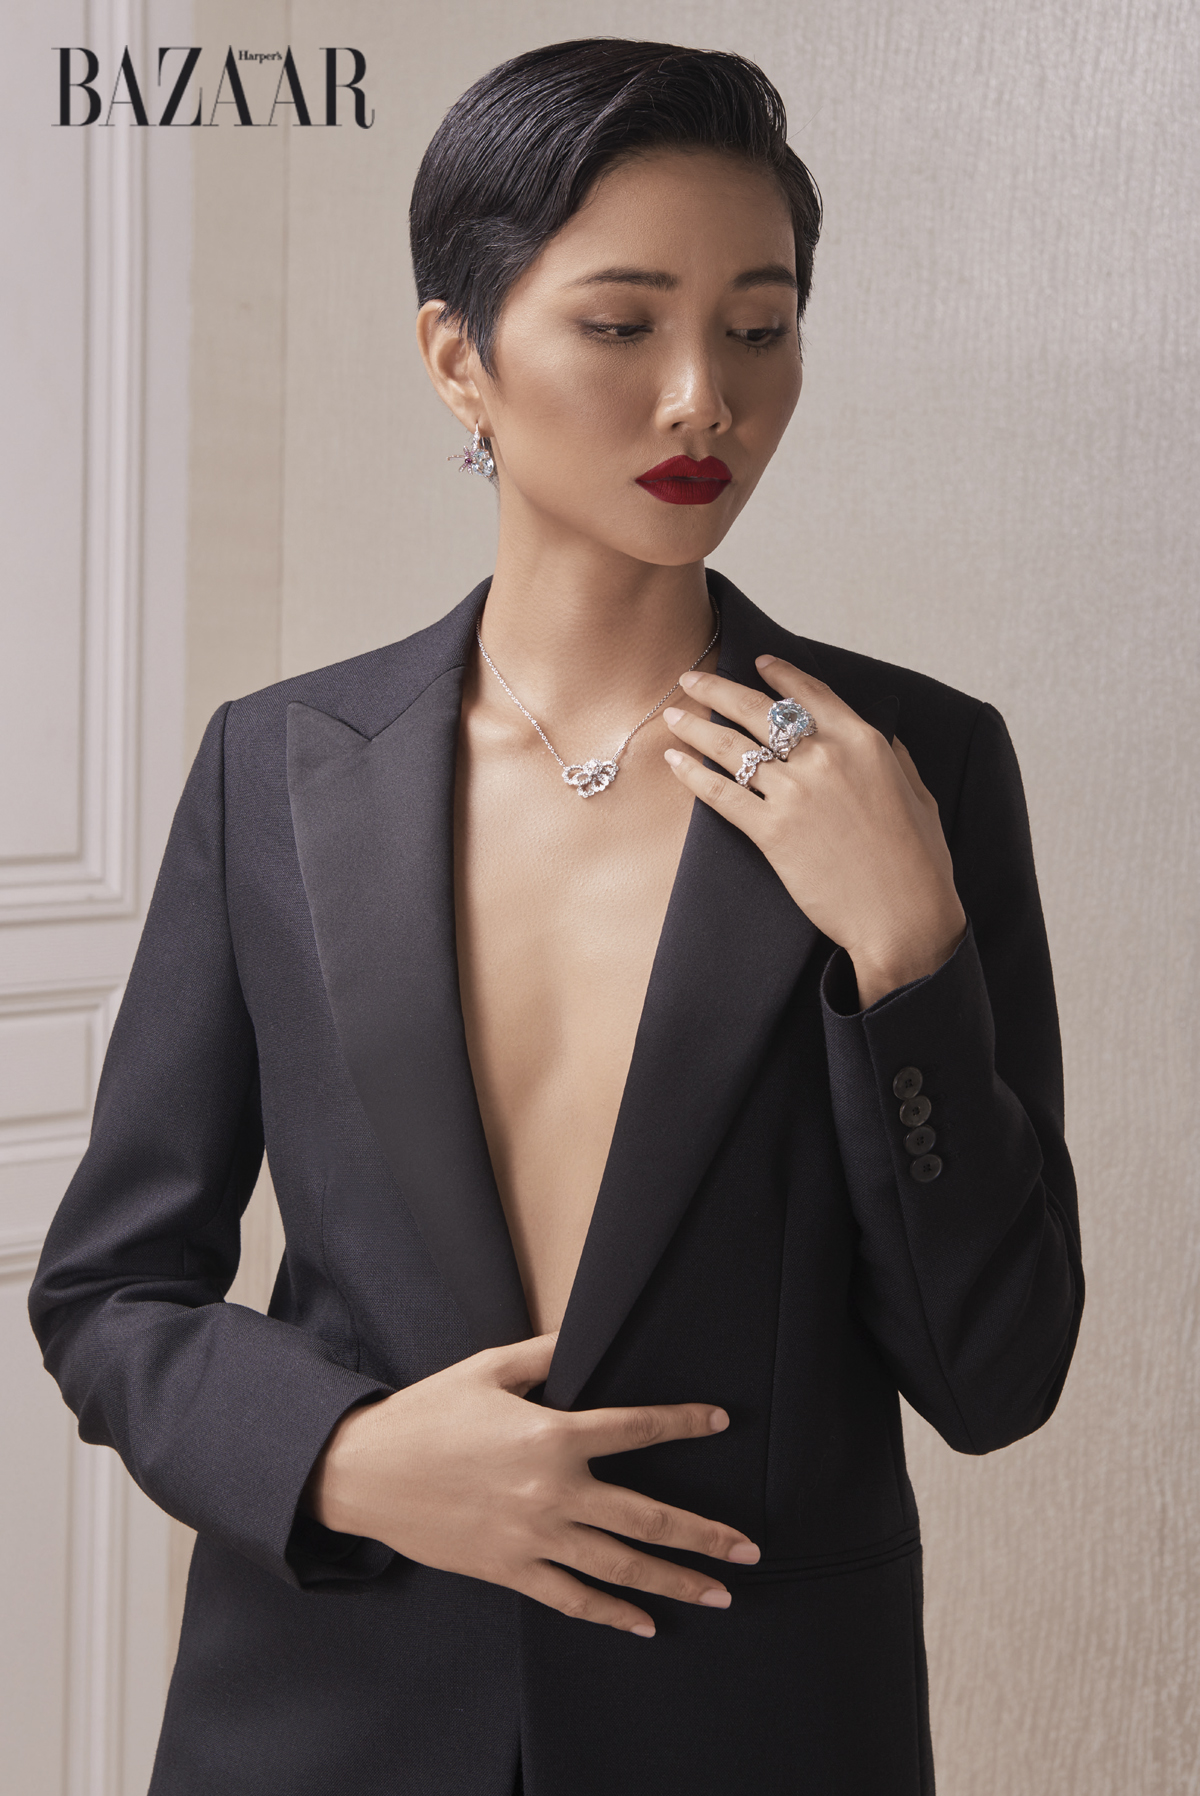 BST_Rose_Dior_Pré_Catelan_hhnie-4